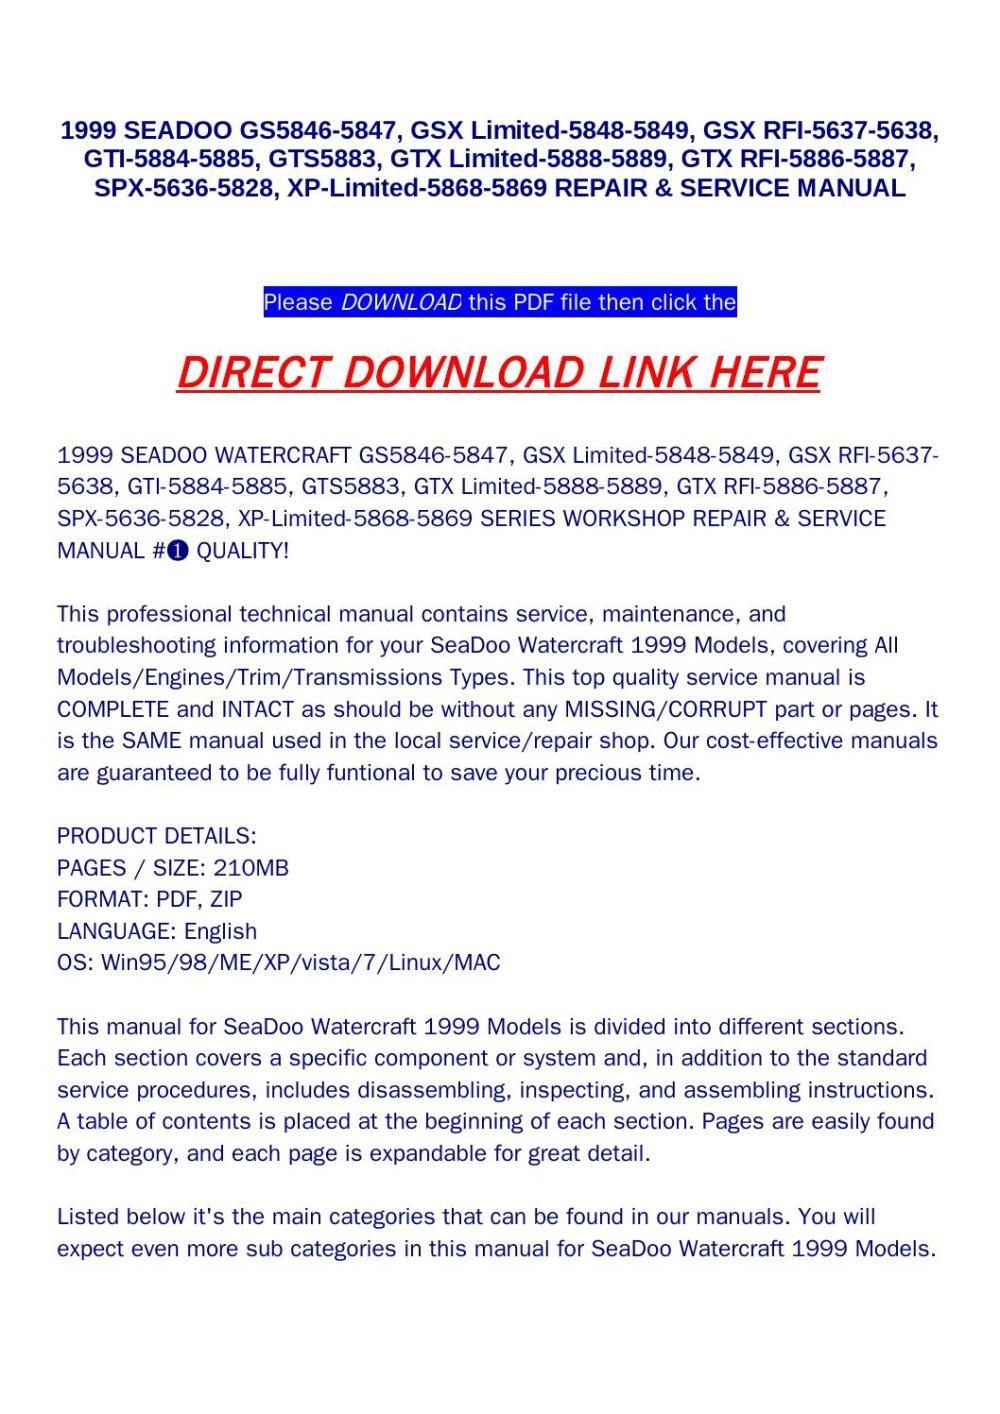 medium resolution of 1999 seadoo gs5846 5847 gsx limited 5848 5849 spx 5636 5828 xp limited 5868 5869 repair service